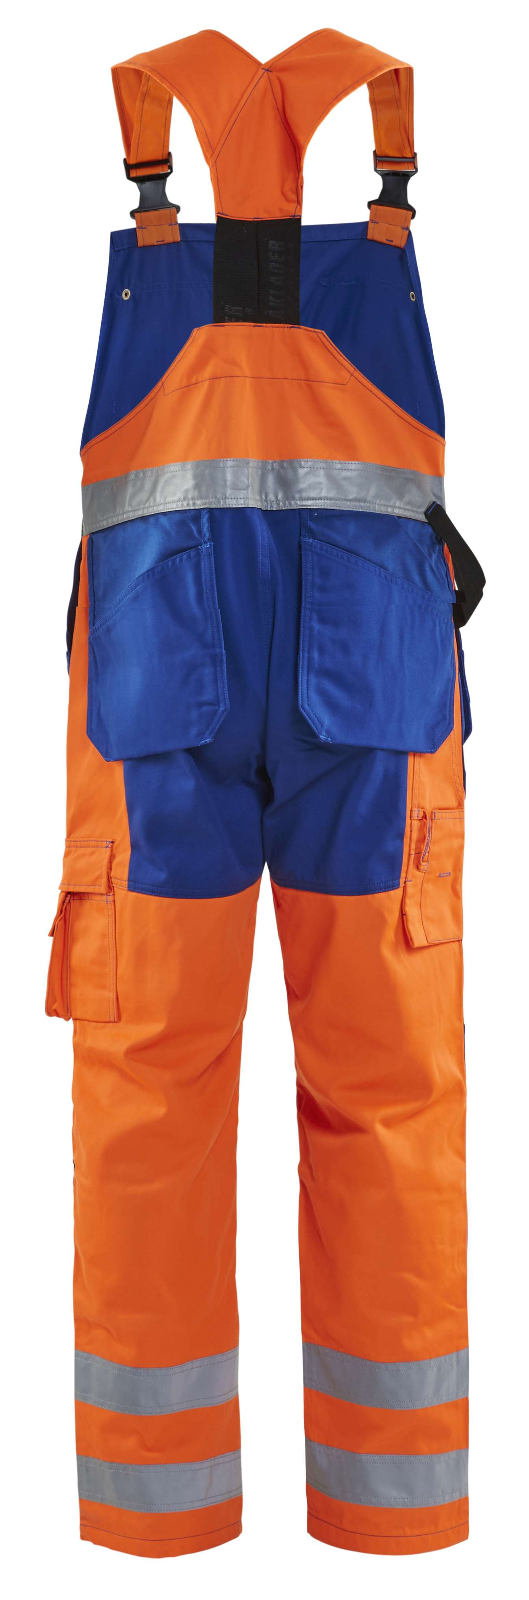 Blaklader Amerikaanse overalls 26031860 High Vis oranje-korenblauw(5385)